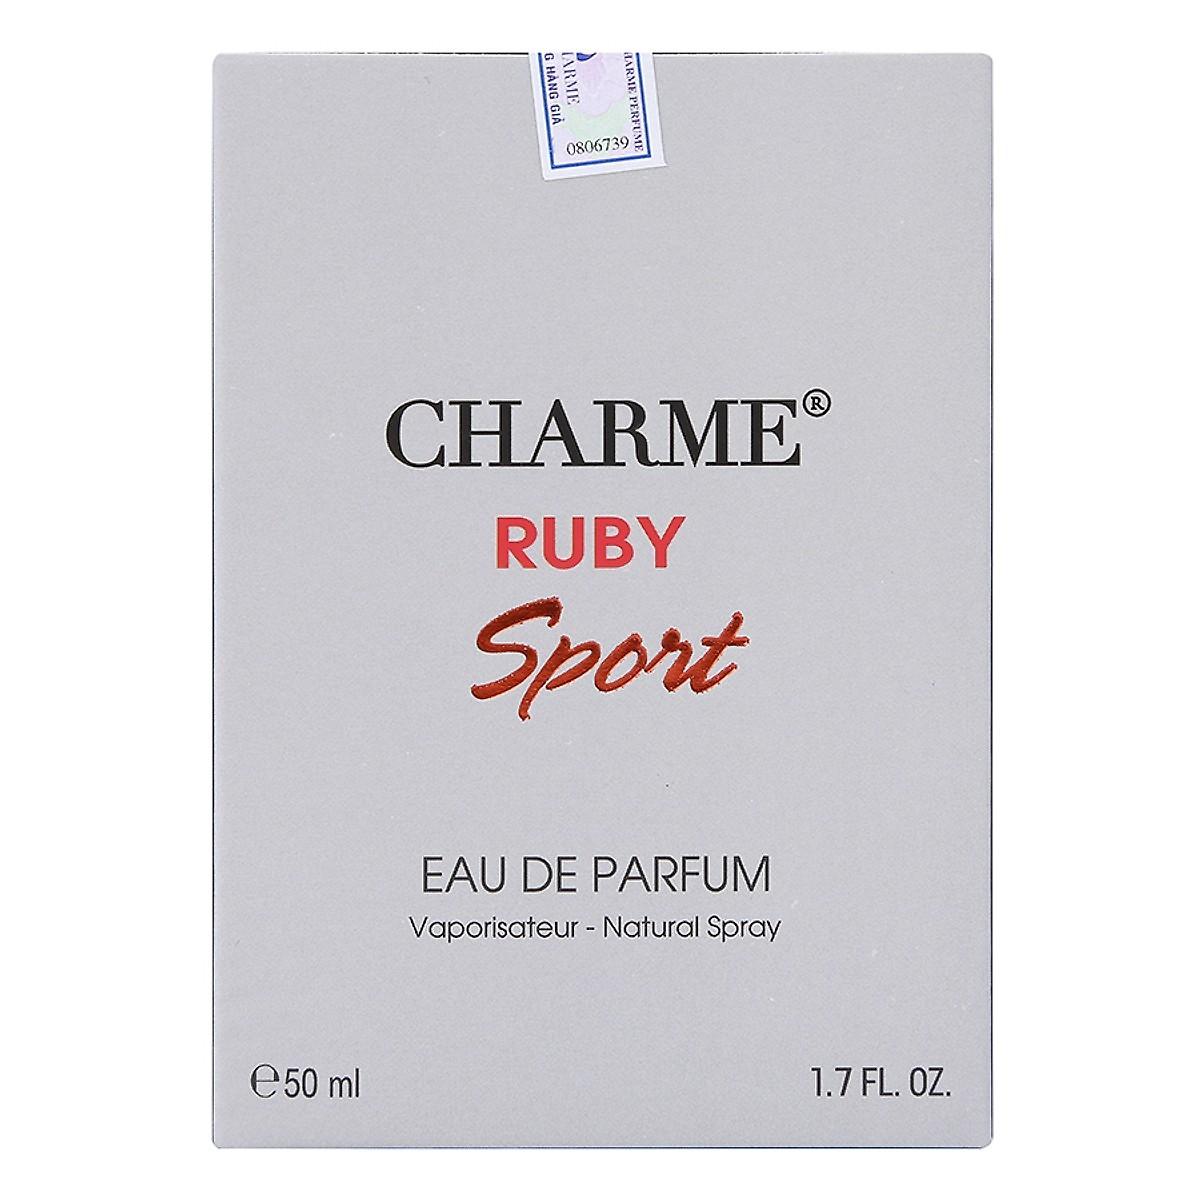 Nước hoa Nam Charme Ruby sport 2018 chai 50ml